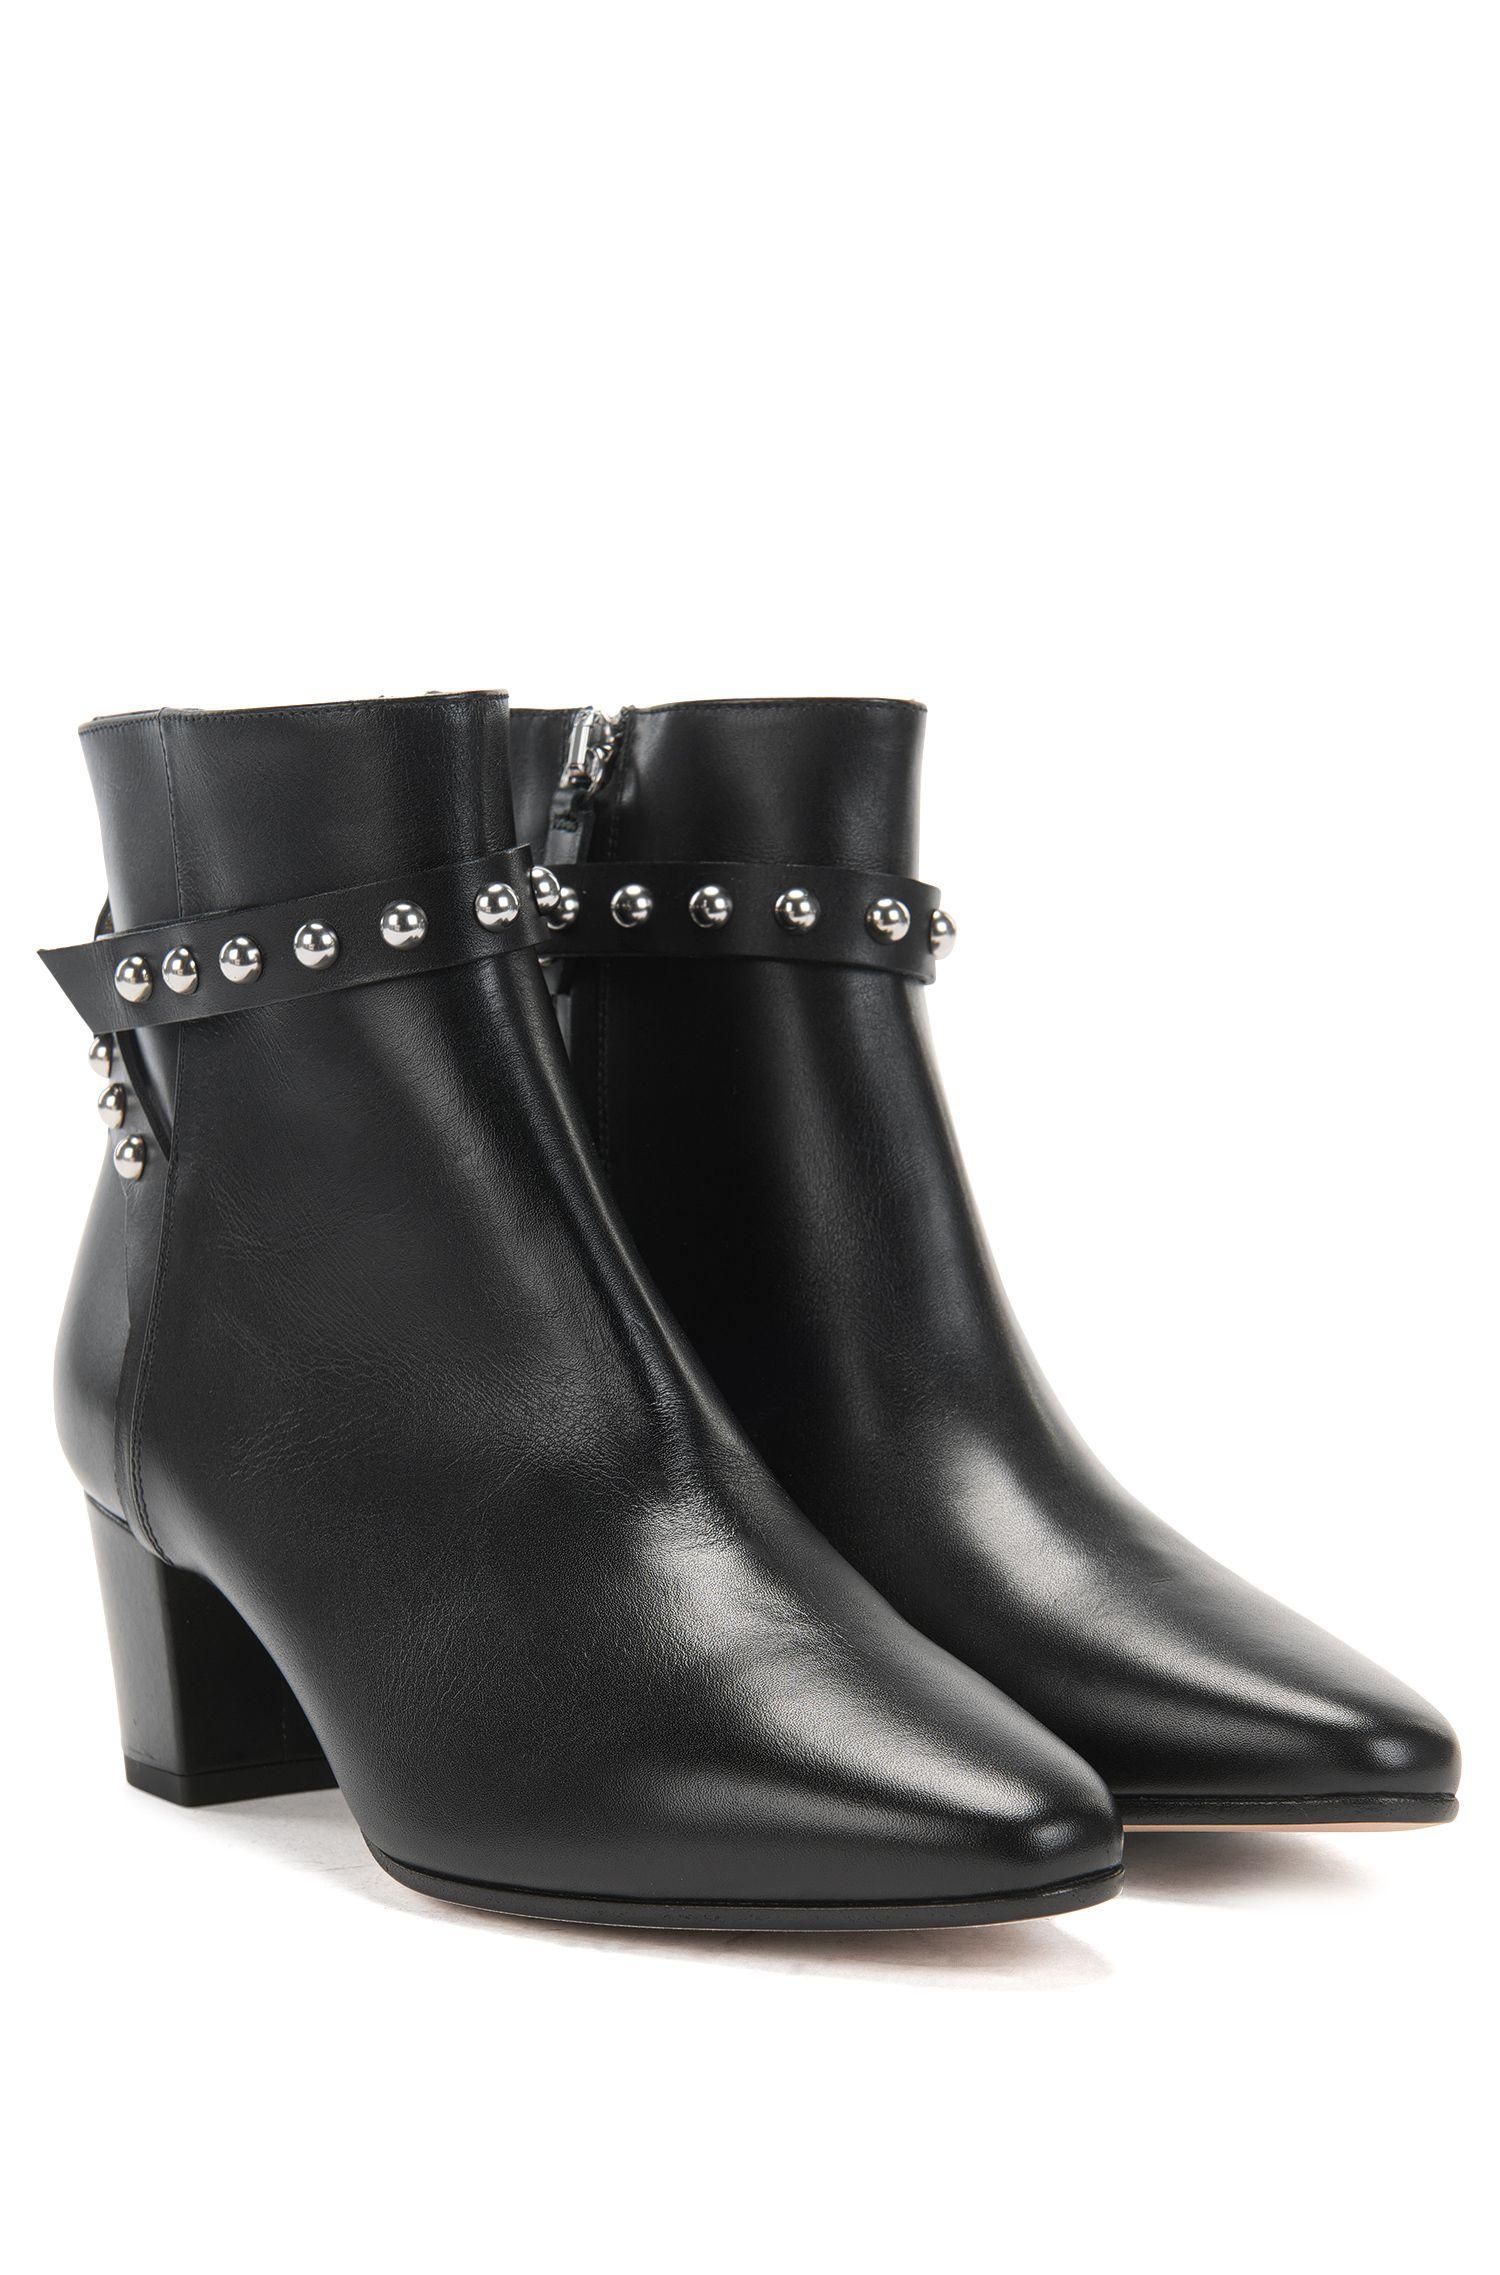 HUGO BOSS Women's Shoreditch Bootie-C Ankle Boots